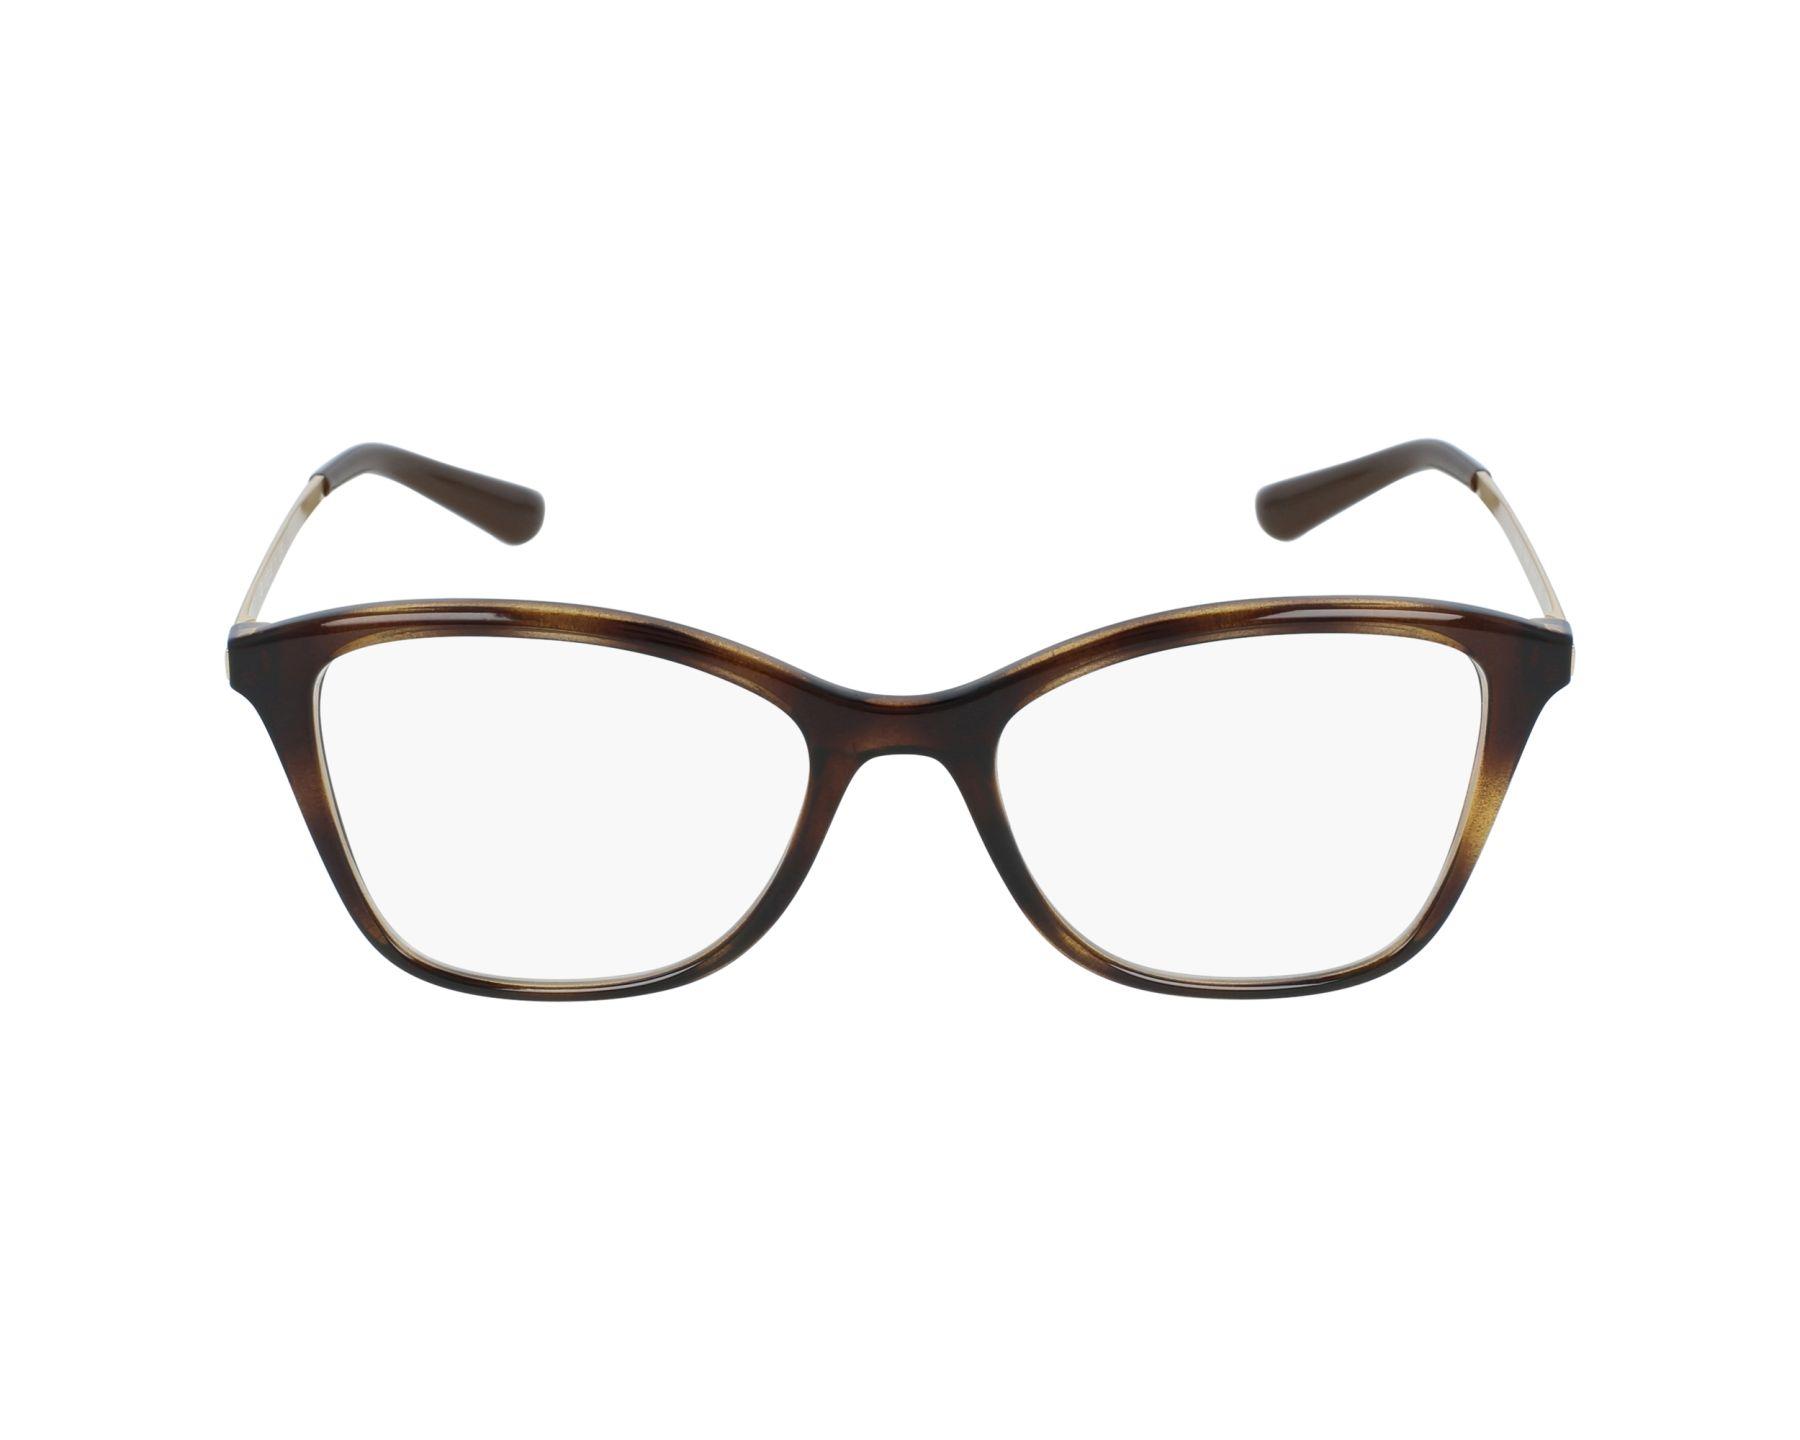 a60df09ed5 Gafas Graduadas Vogue VO-5152 W656 - Havana Oro vista de perfil